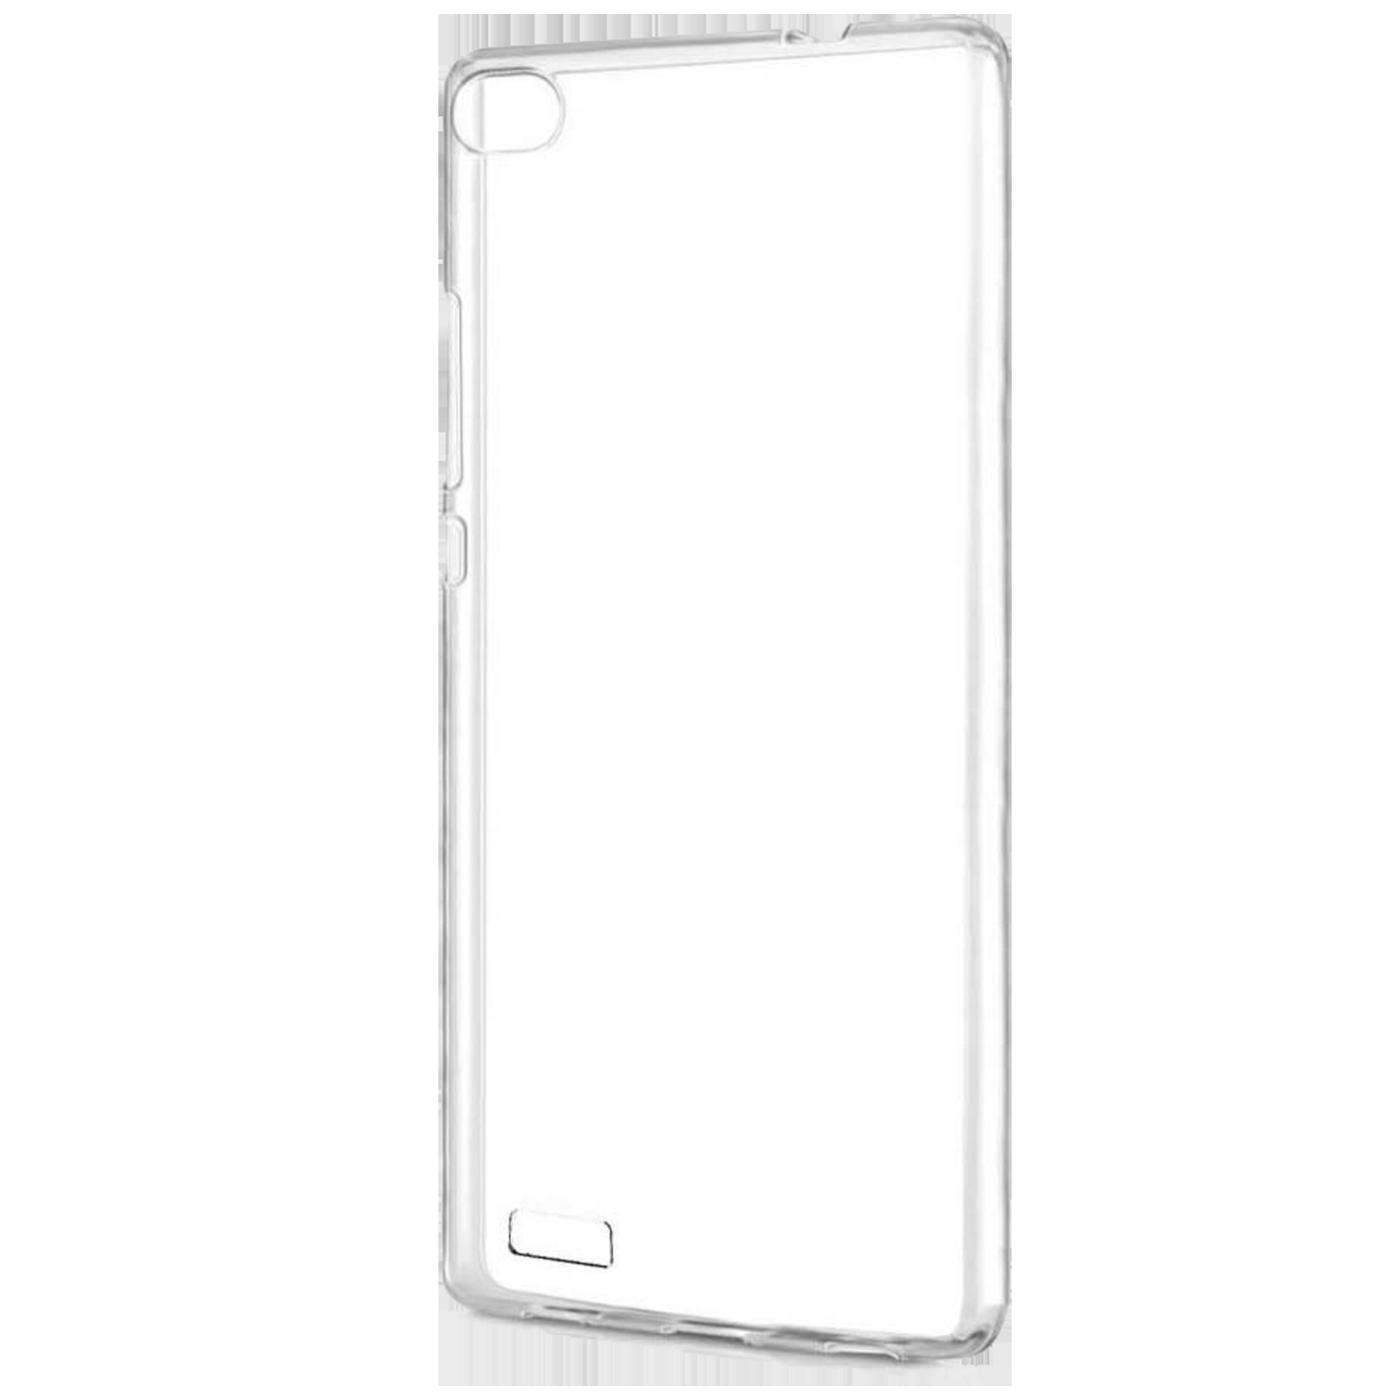 Futrola za mobitel Huawei P8 lite,silikonska,providna